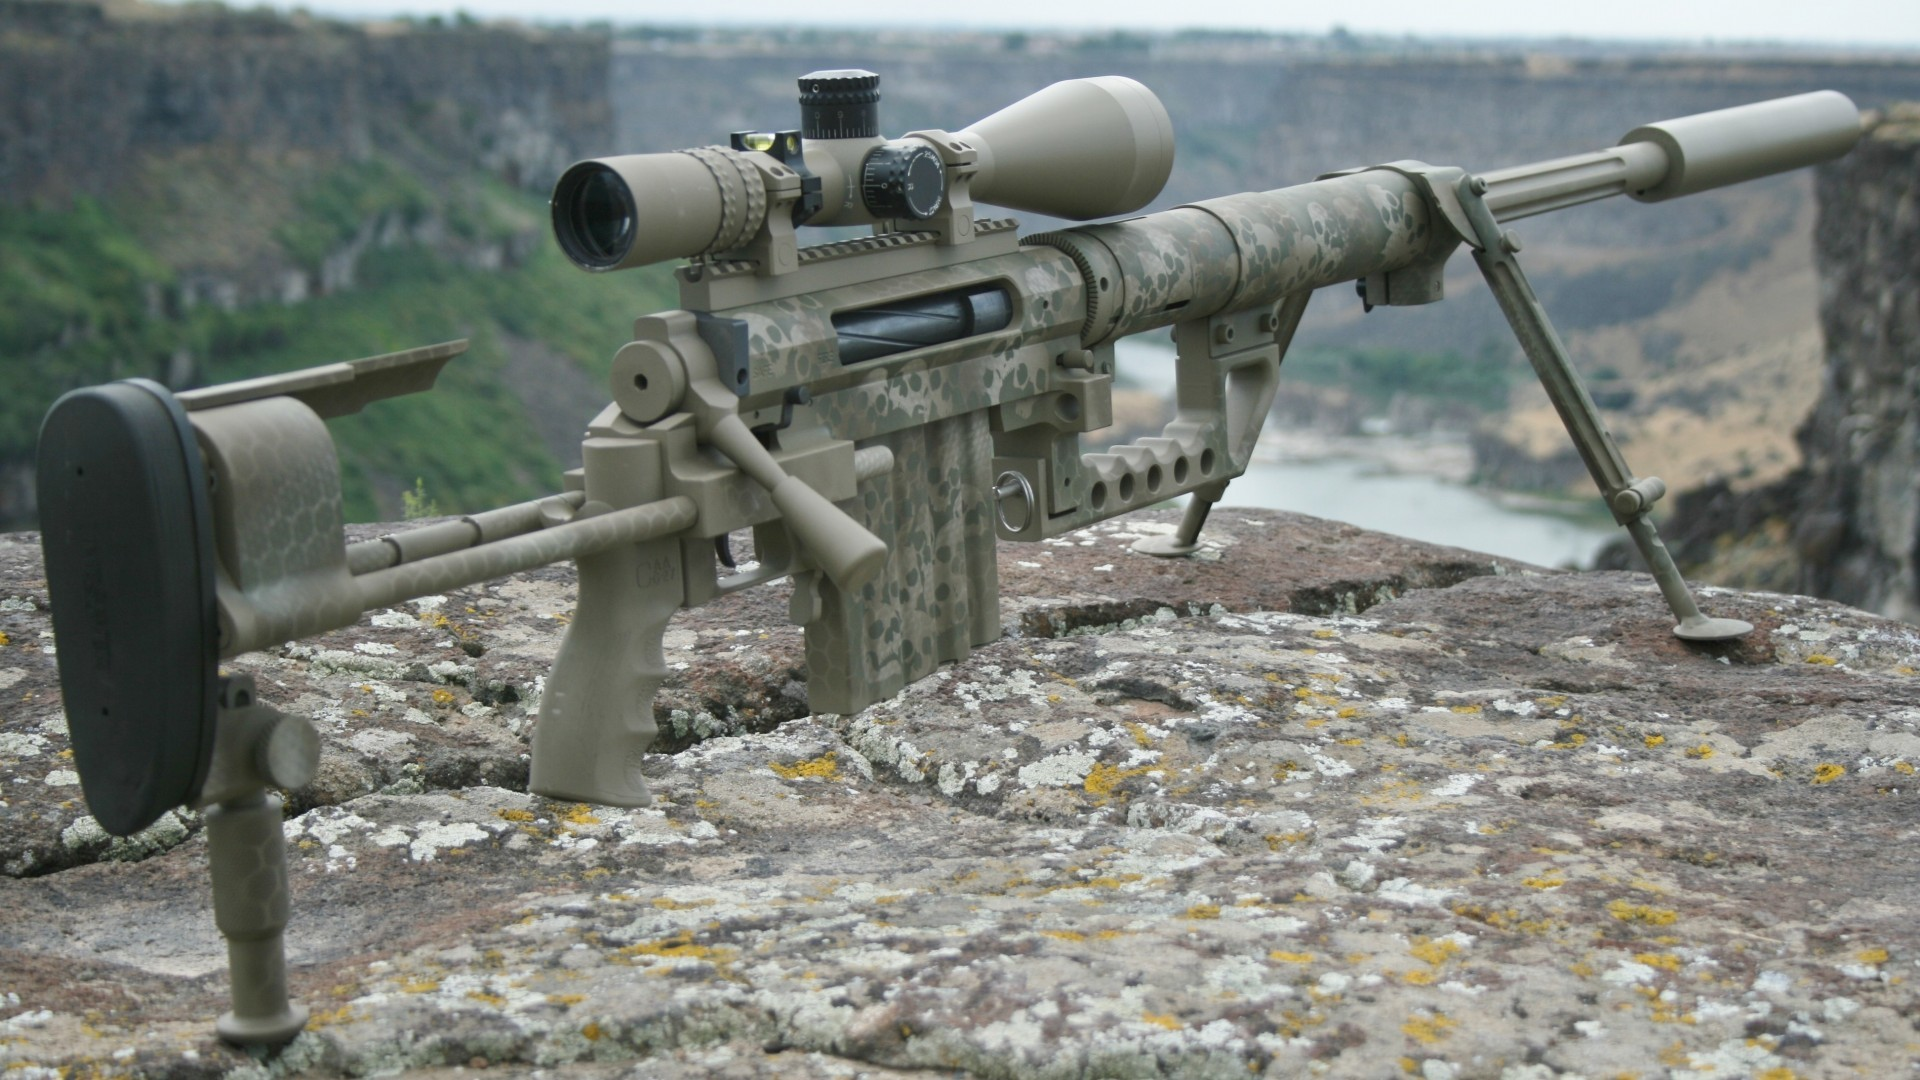 1920x1080 Dragunov Sniper Rifle Wallpaper